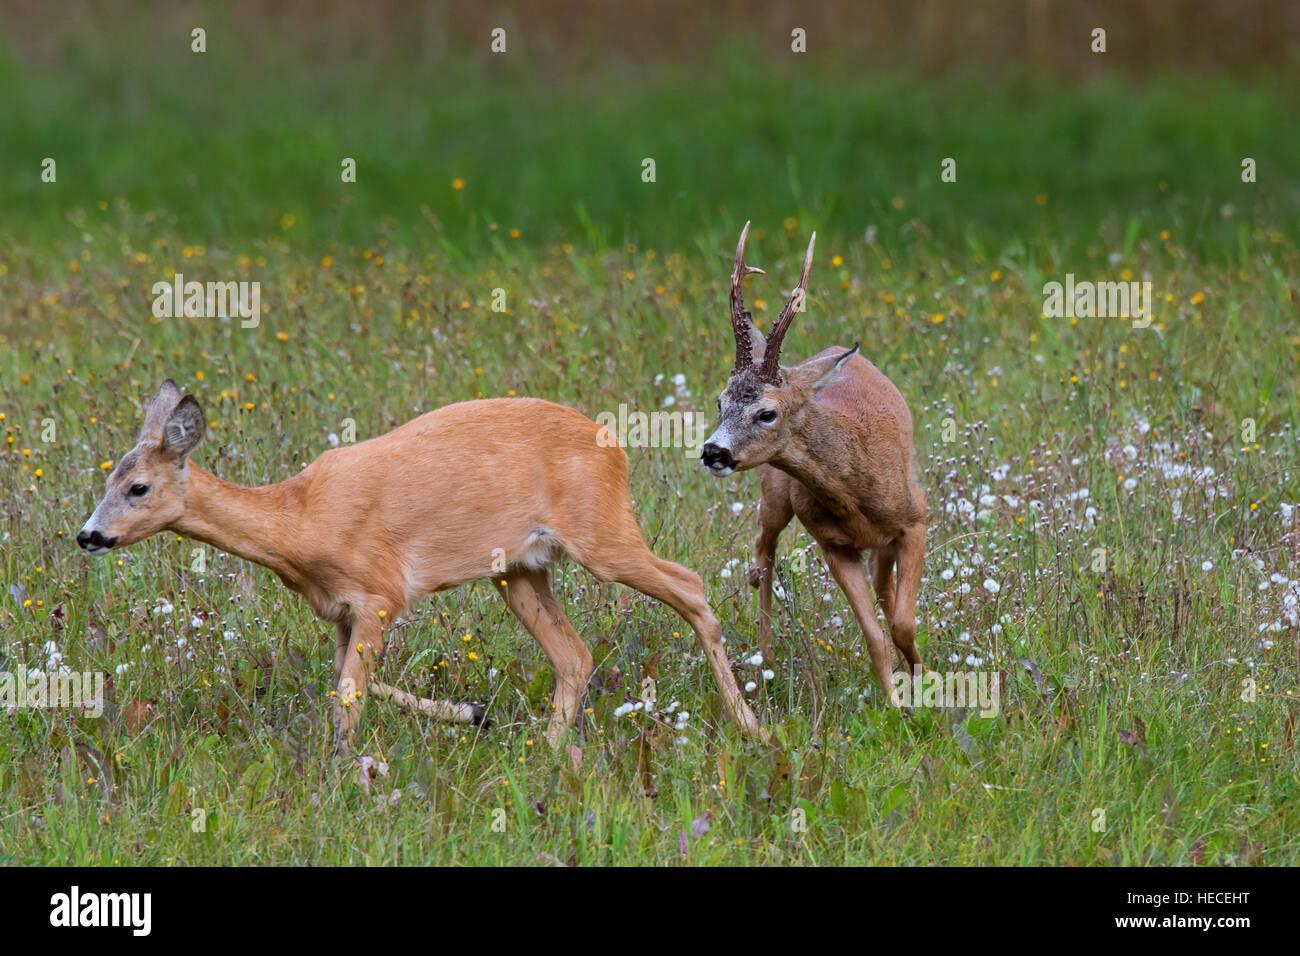 European roe deer (Capreolus capreolus) buck chasing doe in heat before mating during the rut in summer - Stock Image